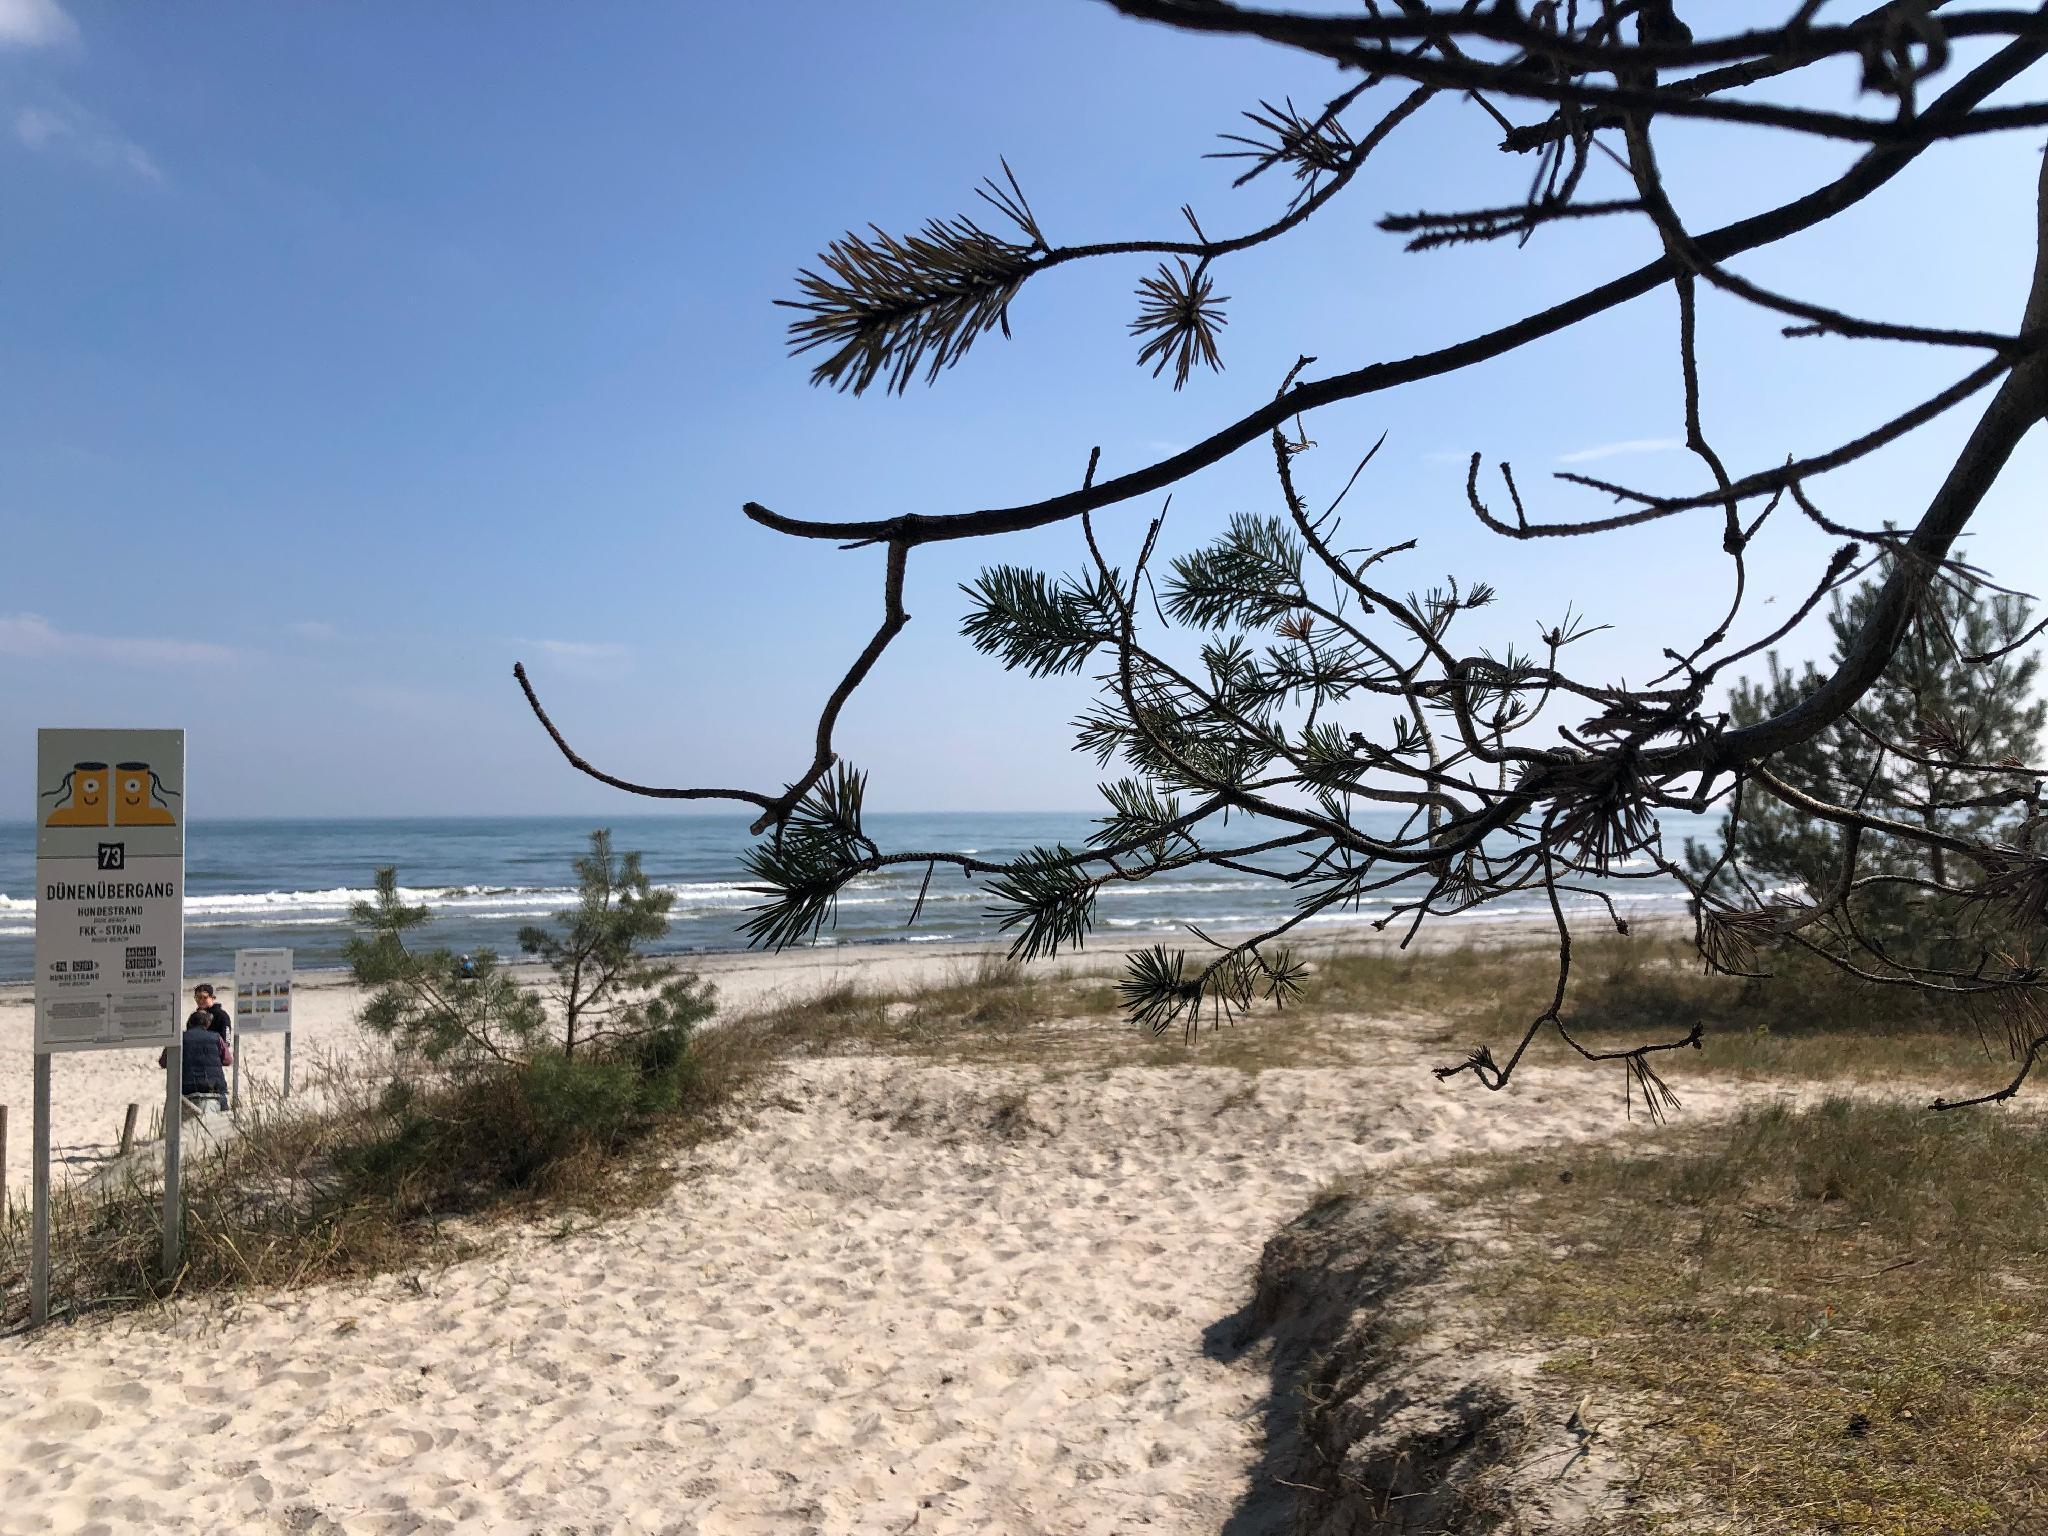 Cozy Beach Getaway KdF Prora Binz MEERESRAUSCHEN